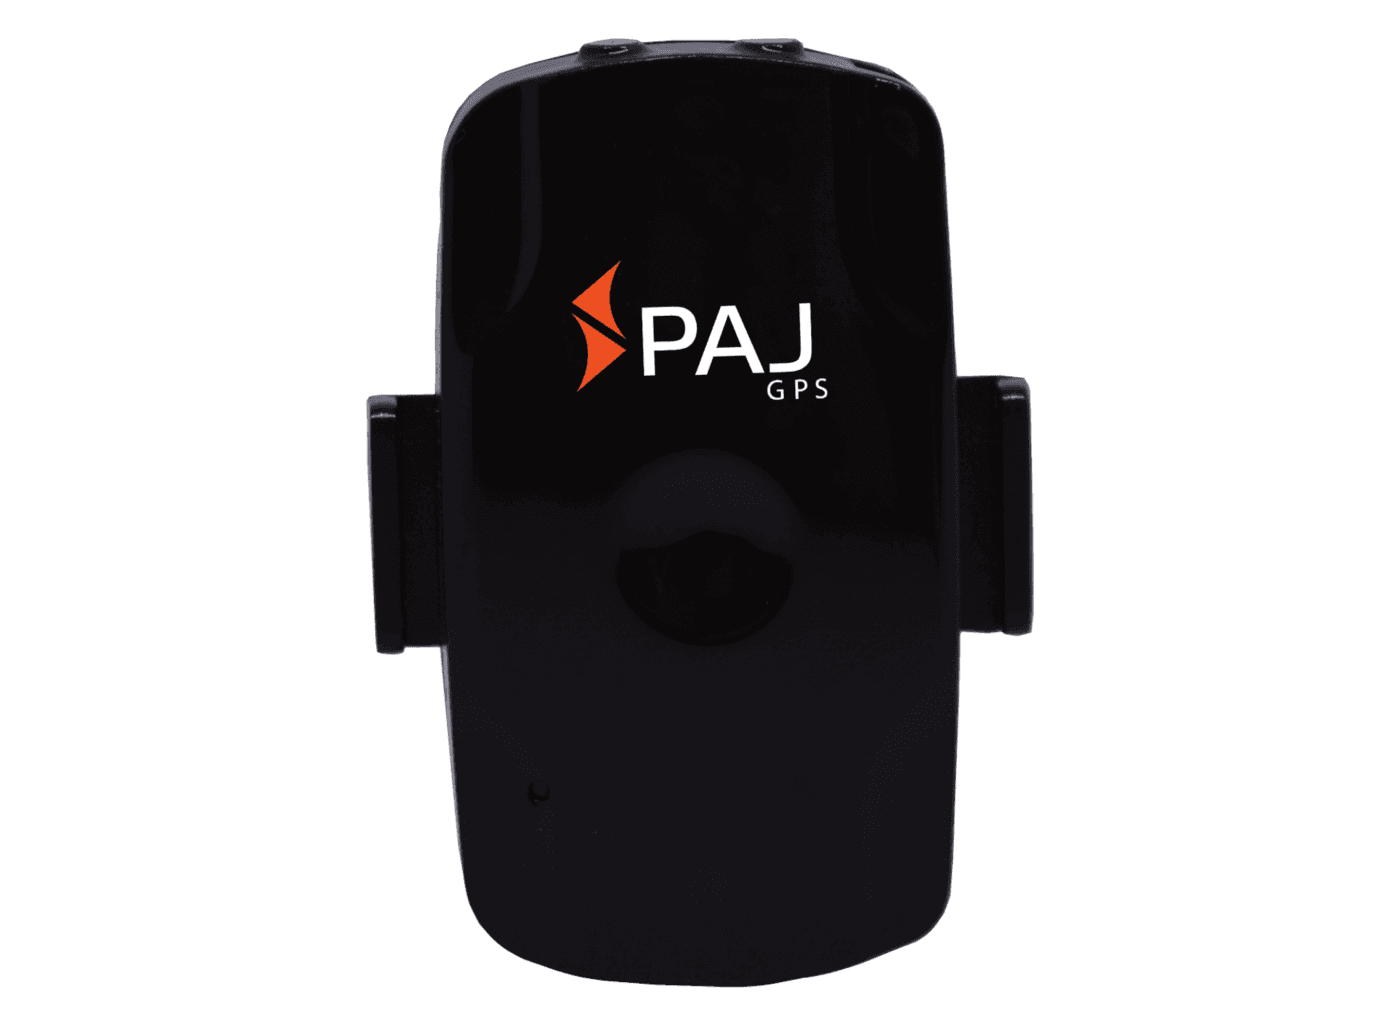 pet 2684x1975 1400x1030 - LTE Coverage